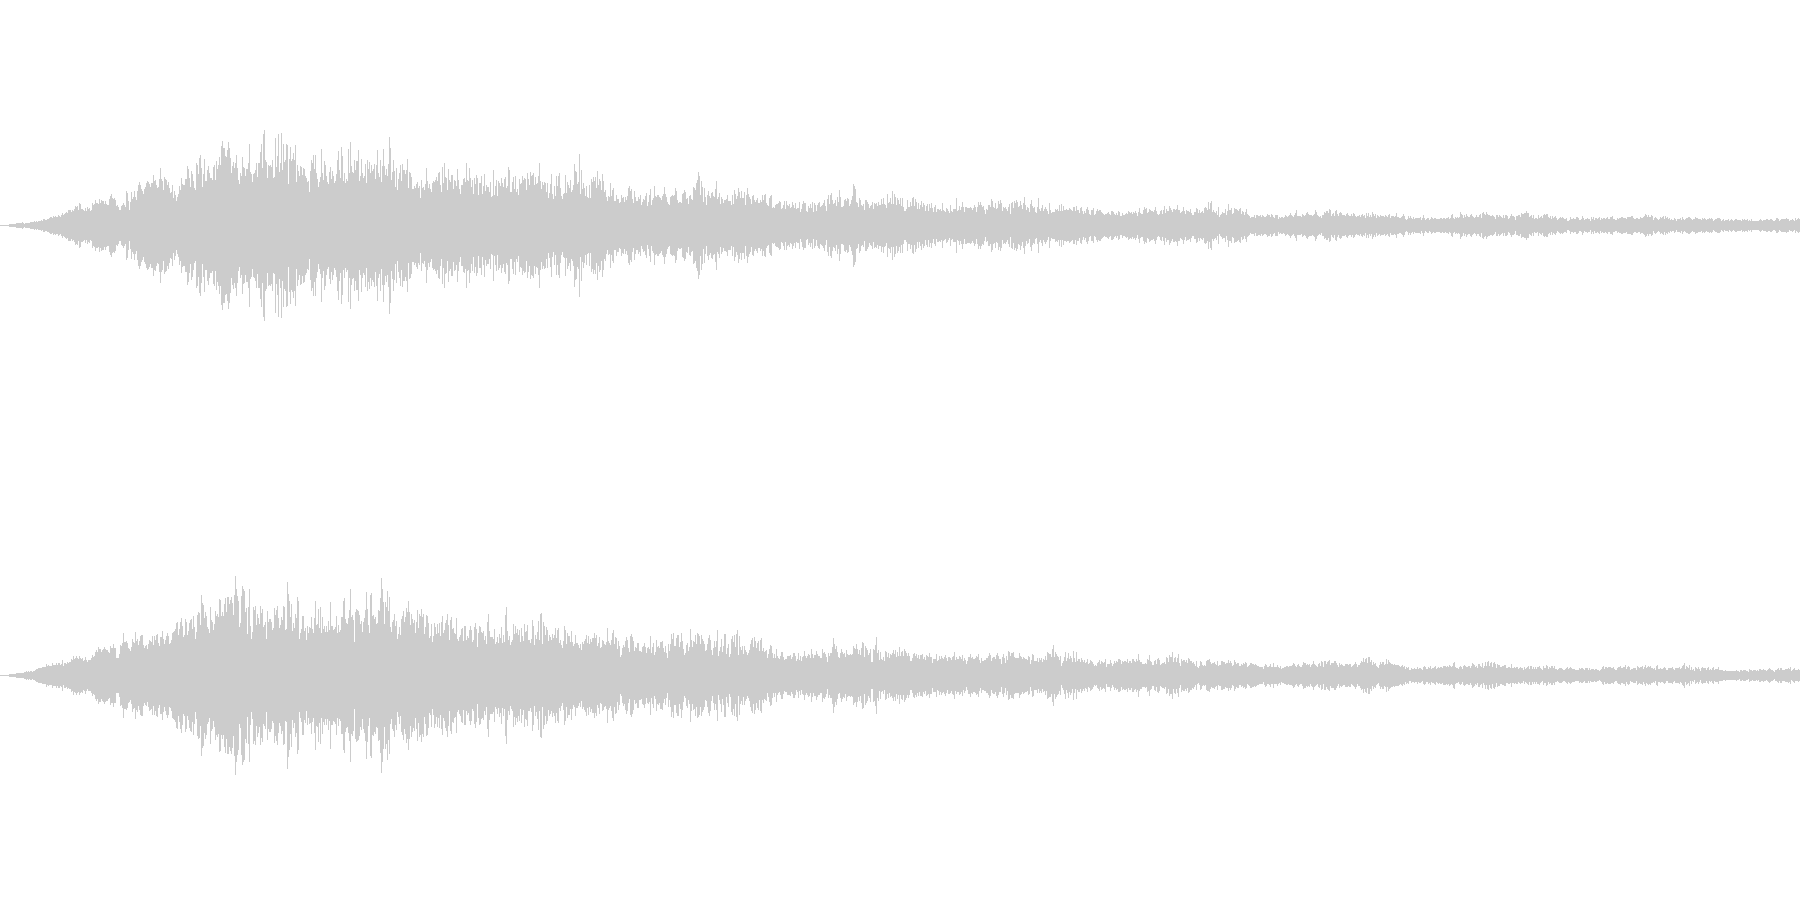 SFっぽい音その4です。「カララララー…の未再生の波形